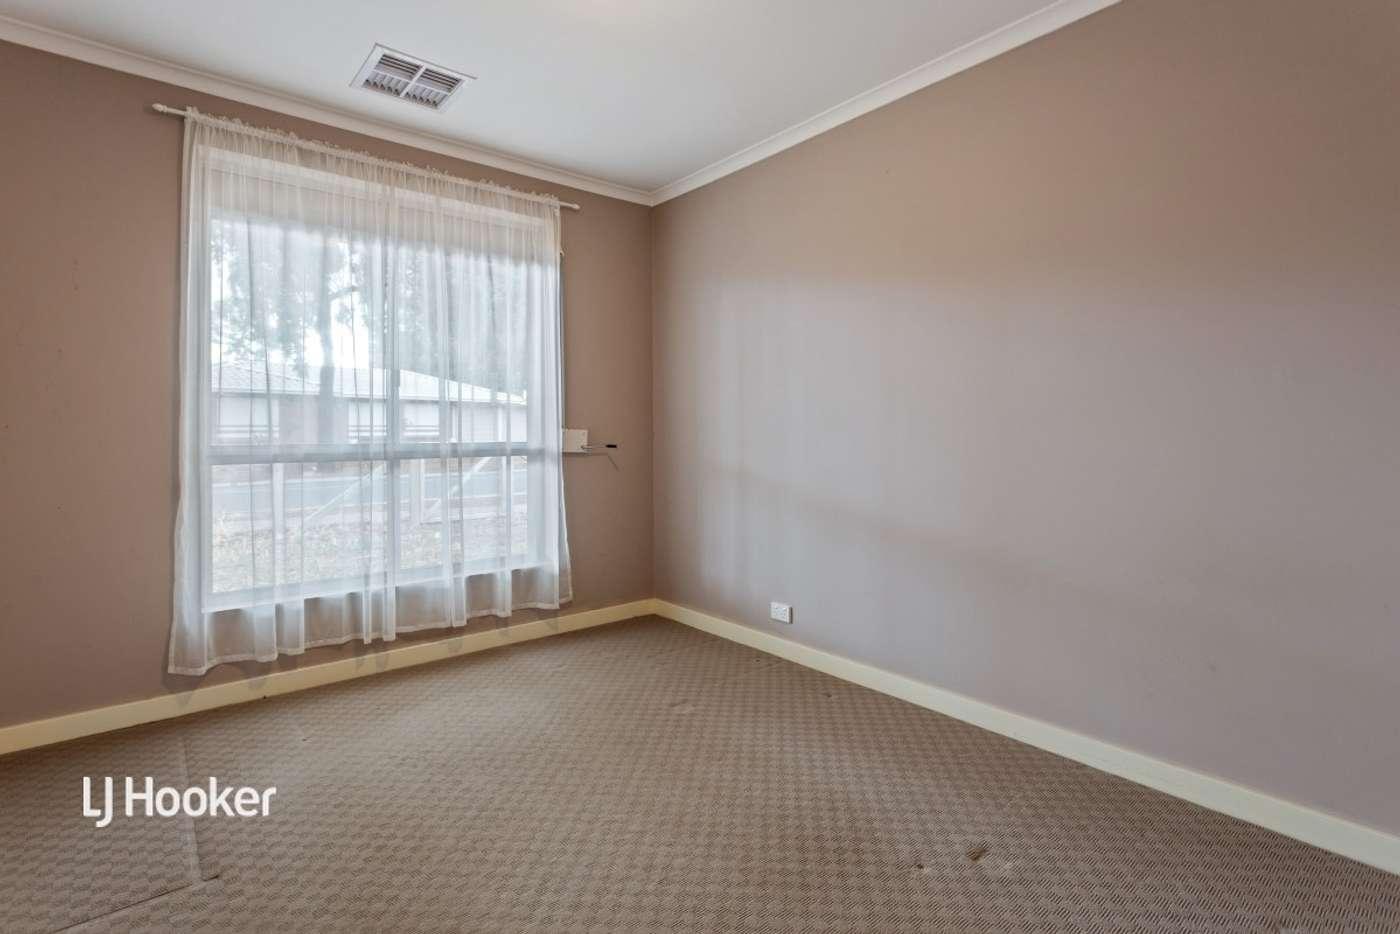 Sixth view of Homely house listing, 8 Casuarina Drive, Parafield Gardens SA 5107